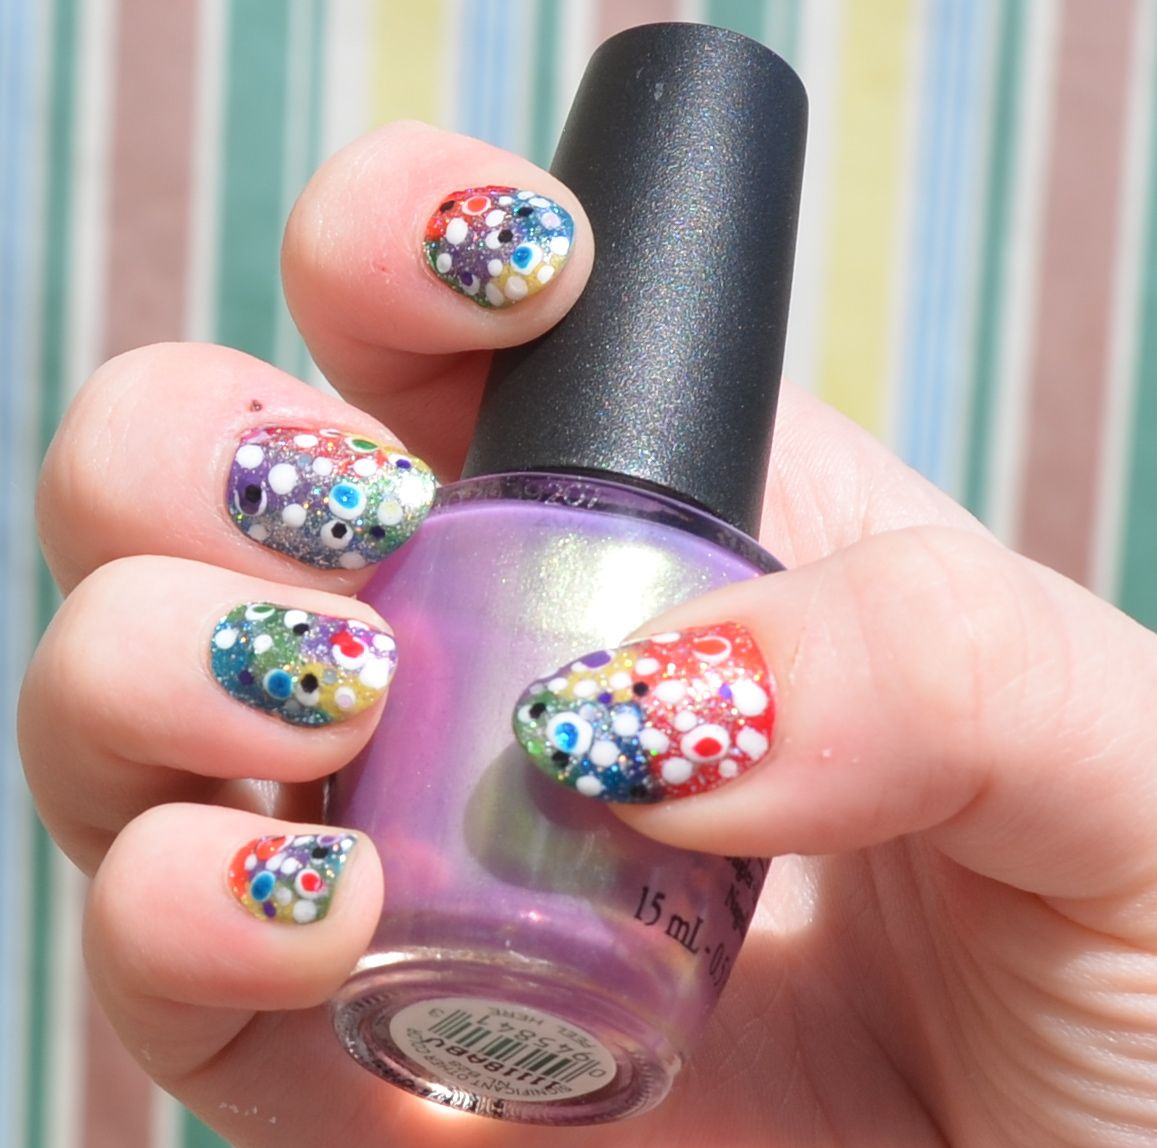 Hodgepodge nail art=)